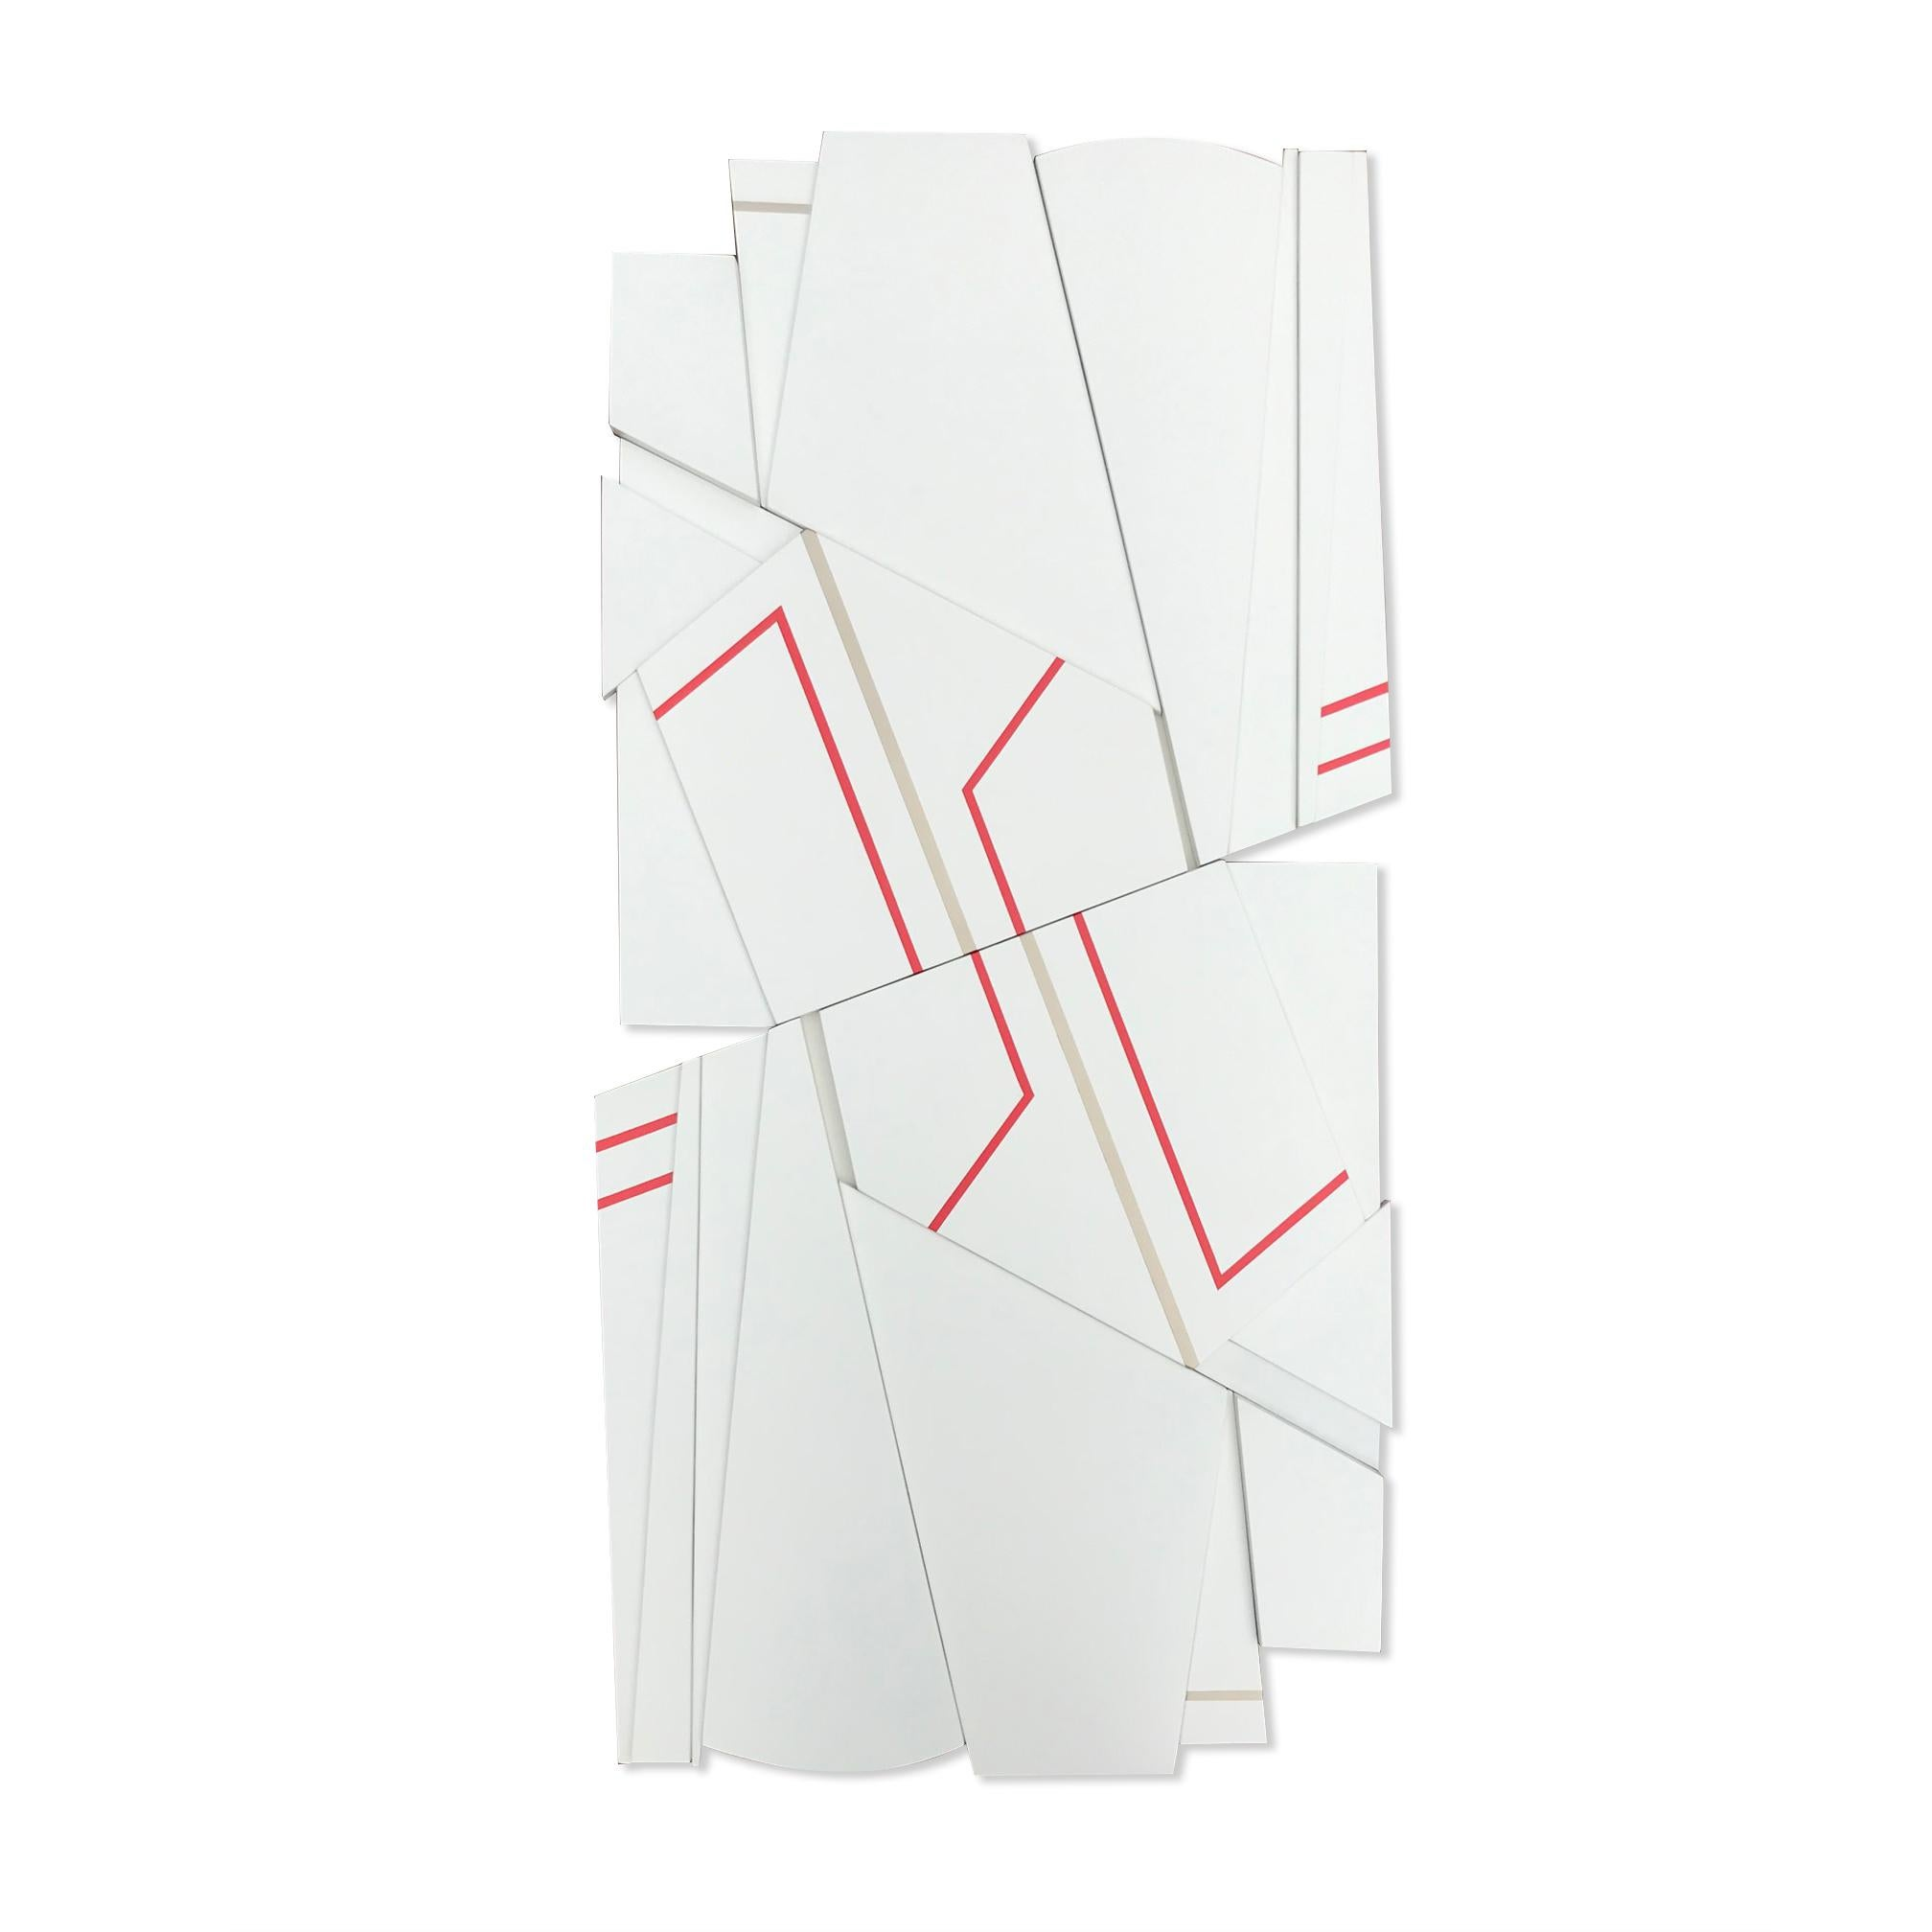 Tonka 2 (wood modernism wall sculpture minimal geometric modern ivory cream